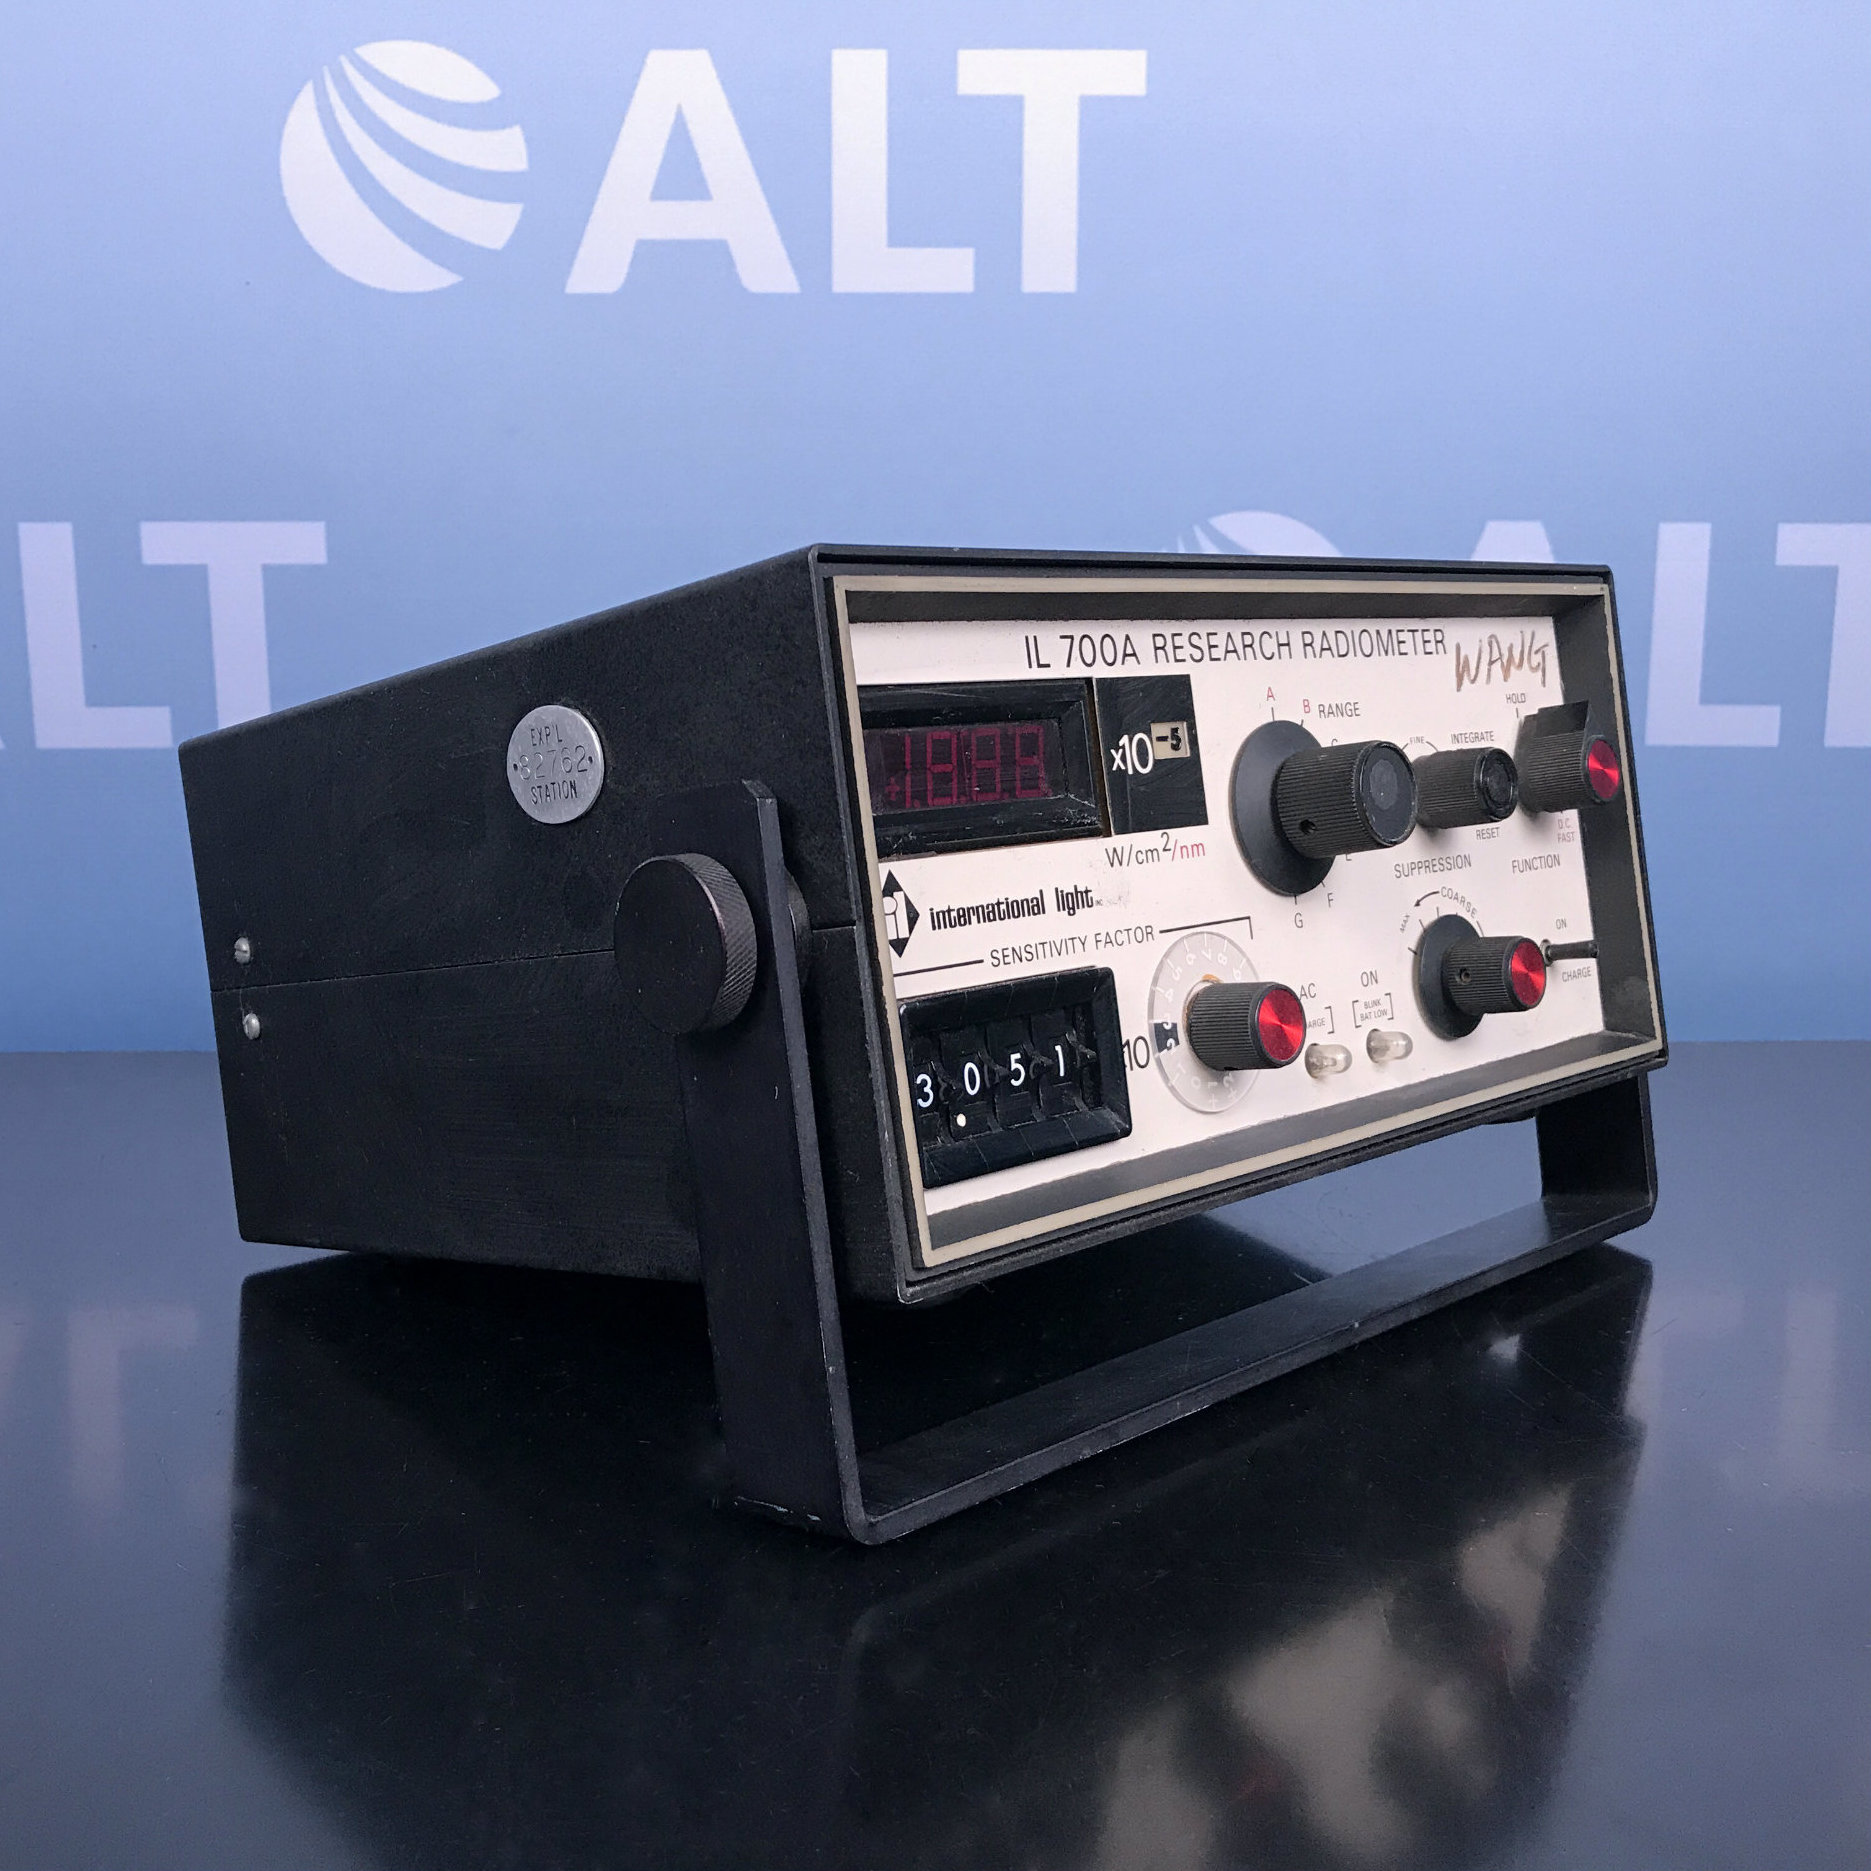 International Light IL 700A Research Radiometer Image